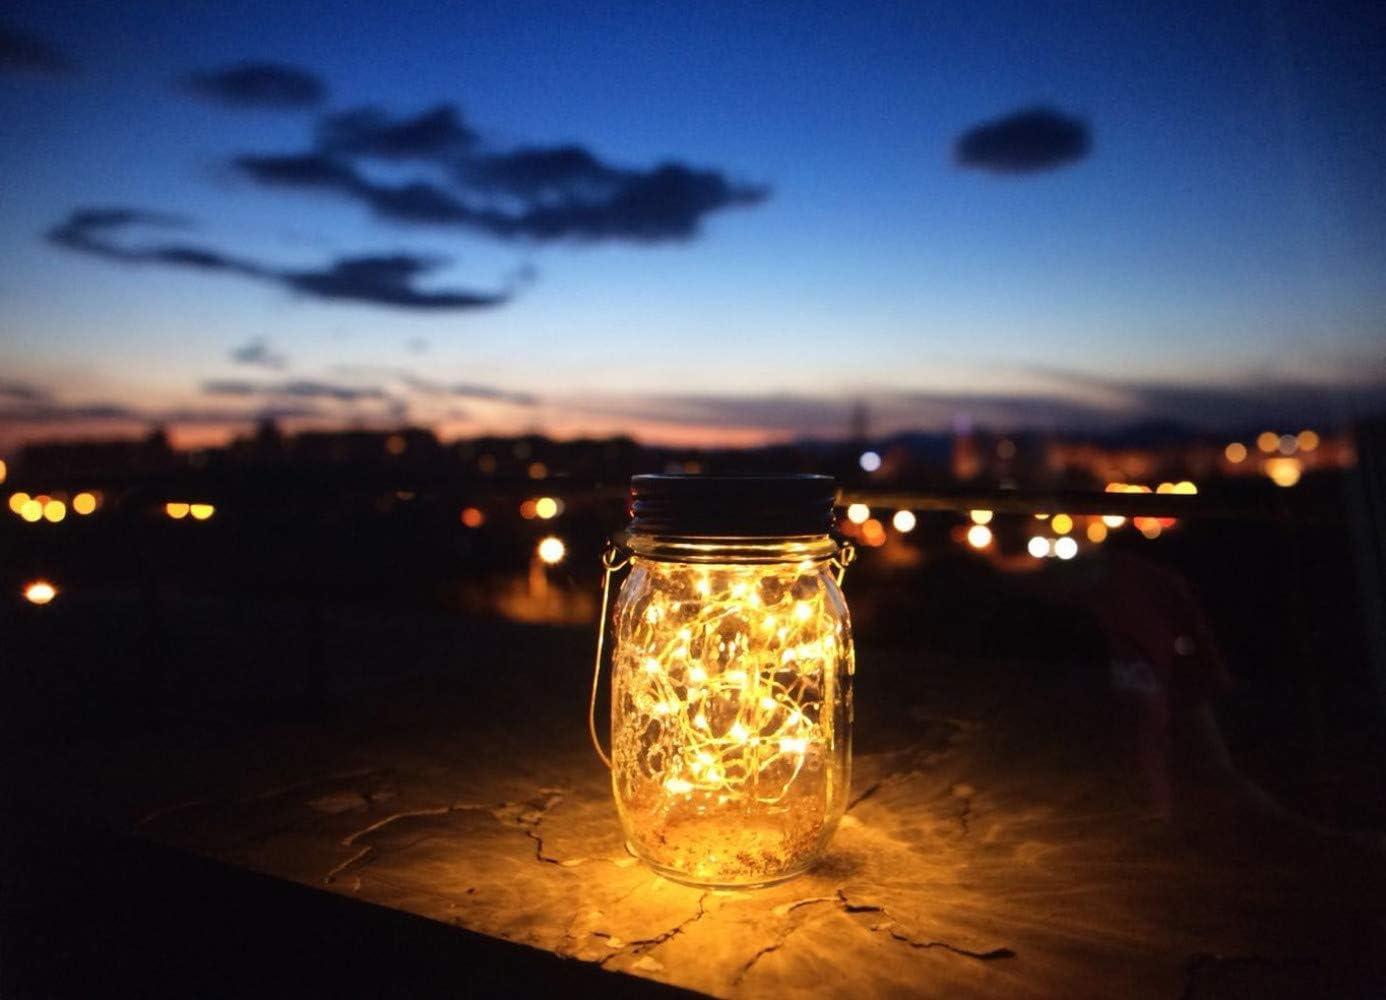 MARTHA&IVAN 30 LED Mason Jar Solar Lights,Solar Garden Ornaments Outdoor,Solar Fairy Jars,Hanging Lanterns Light,Patio Path Lights Decoration Light,Gift and Decor for Christmas,Holiday,Ceremony